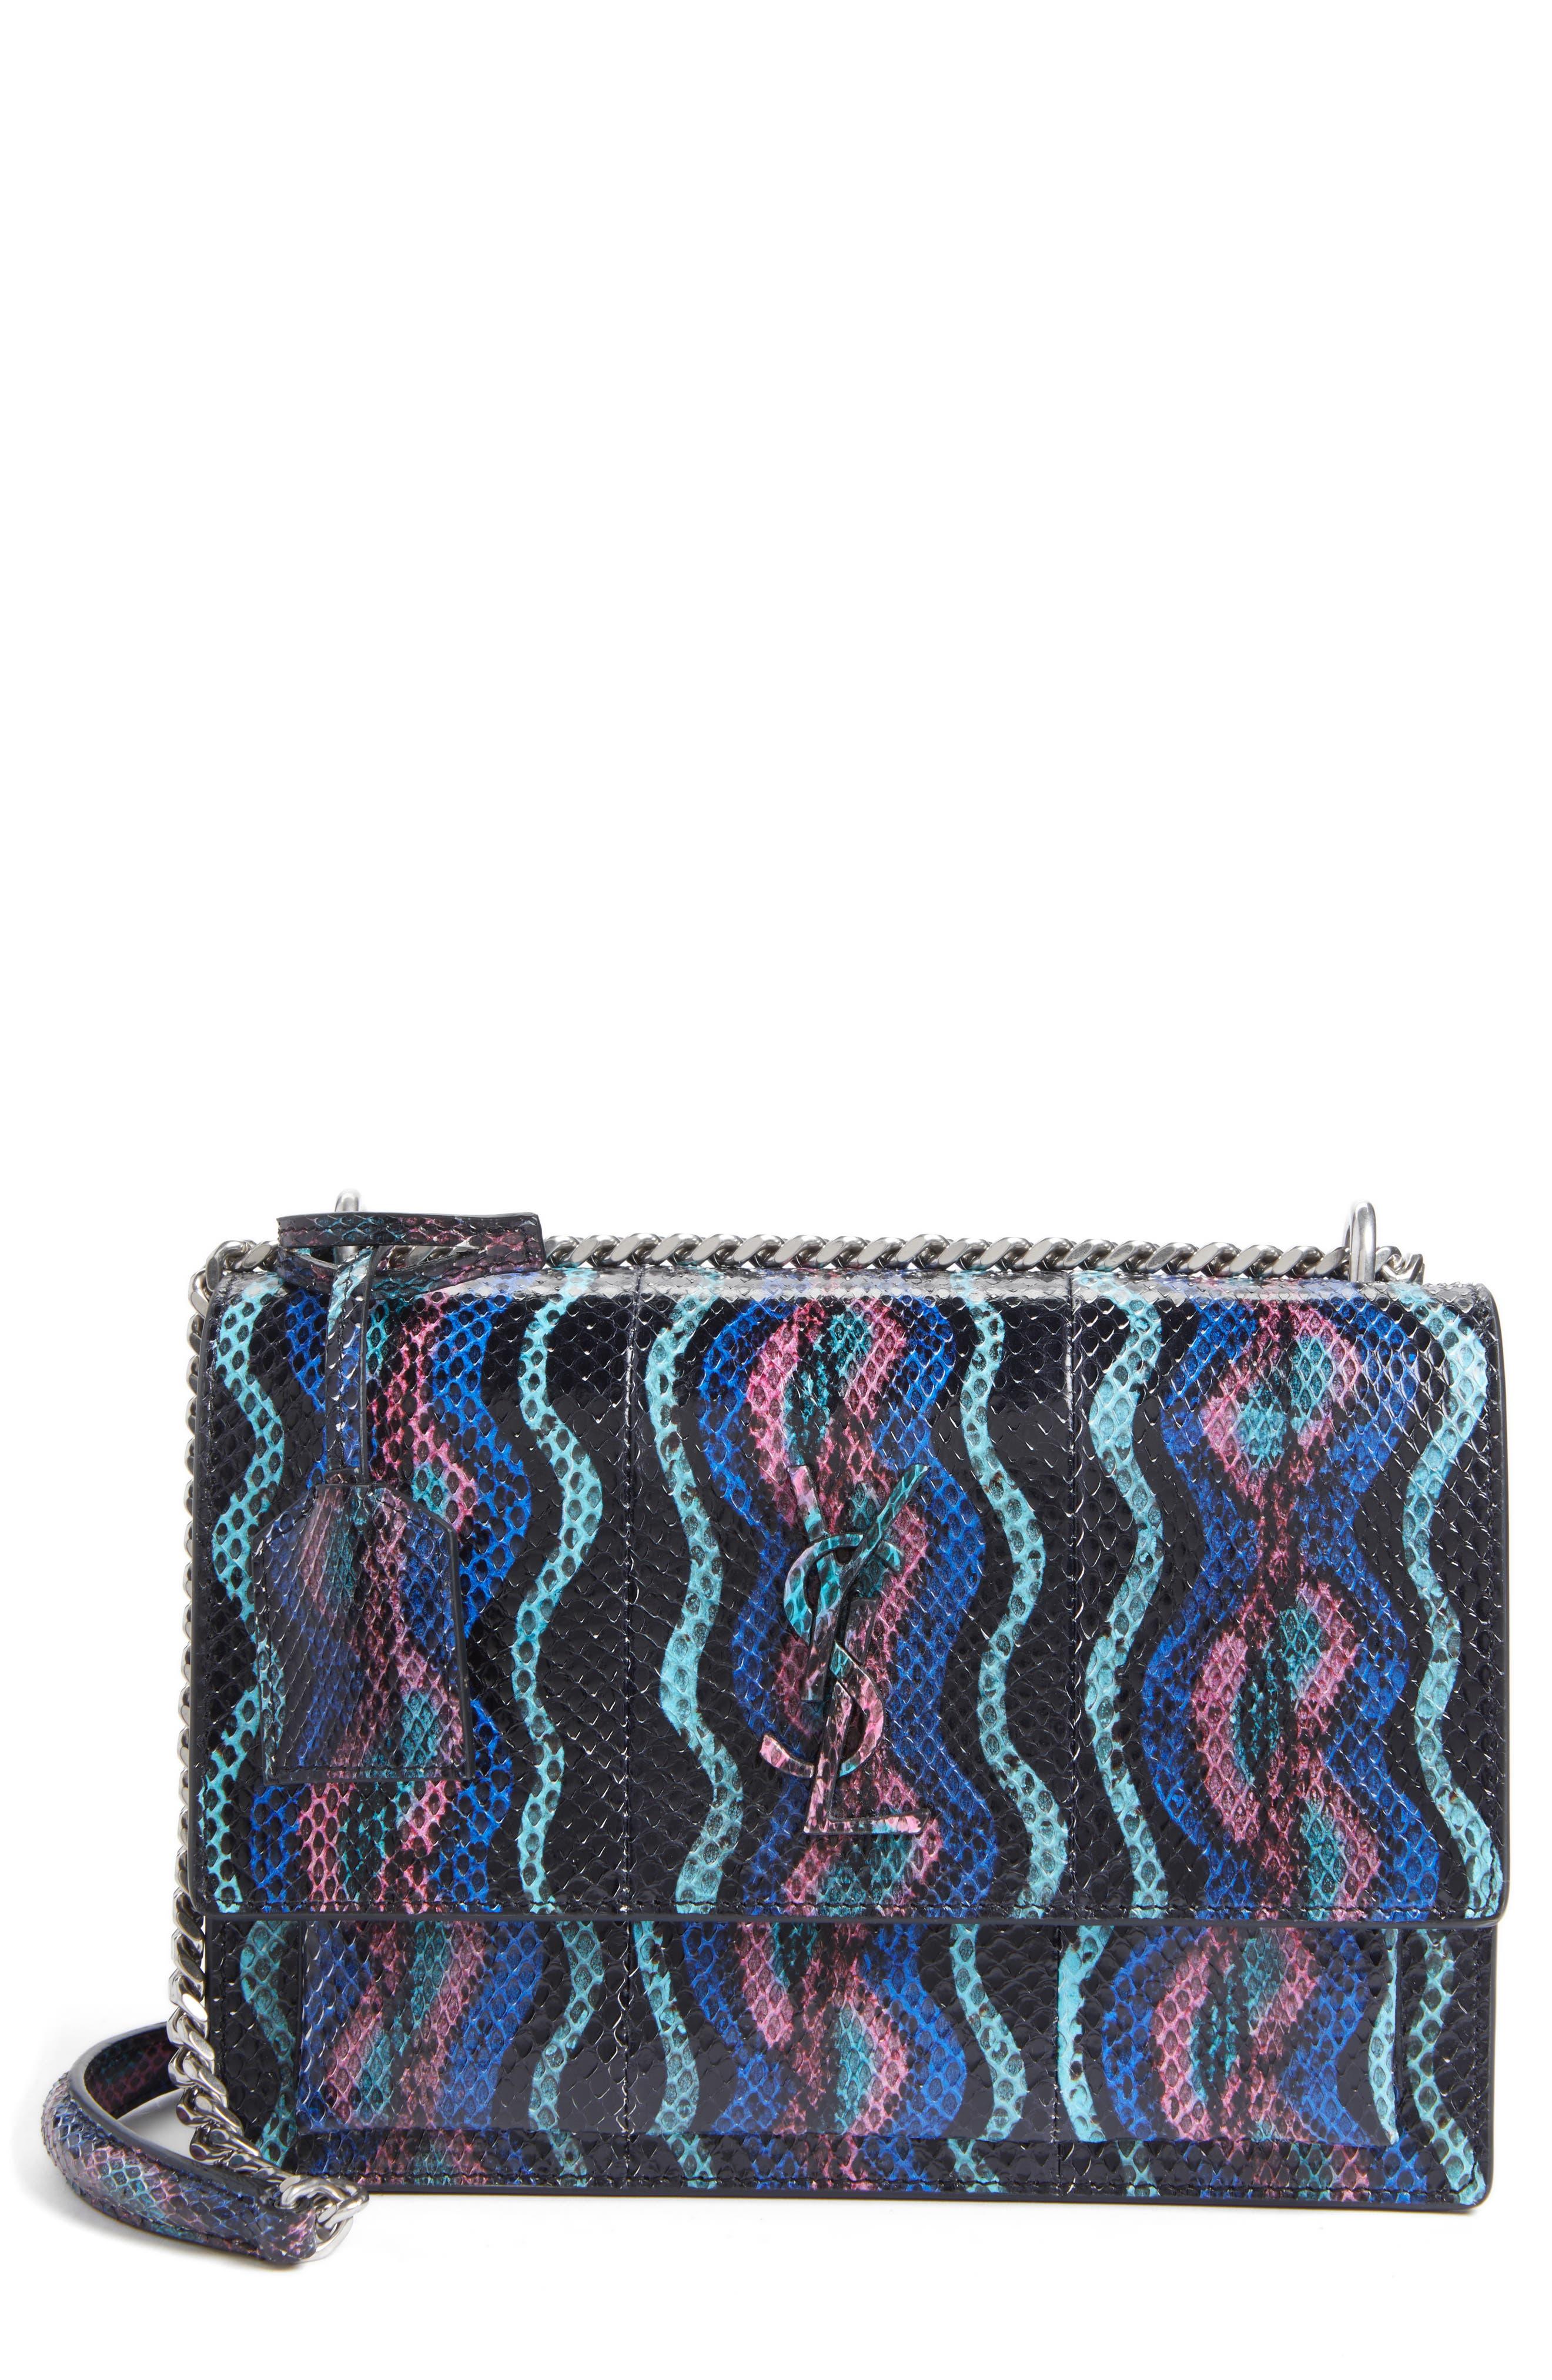 Medium Monogram Sunset Genuine Snakeskin Crossbody Bag,                             Main thumbnail 1, color,                             Black Multi